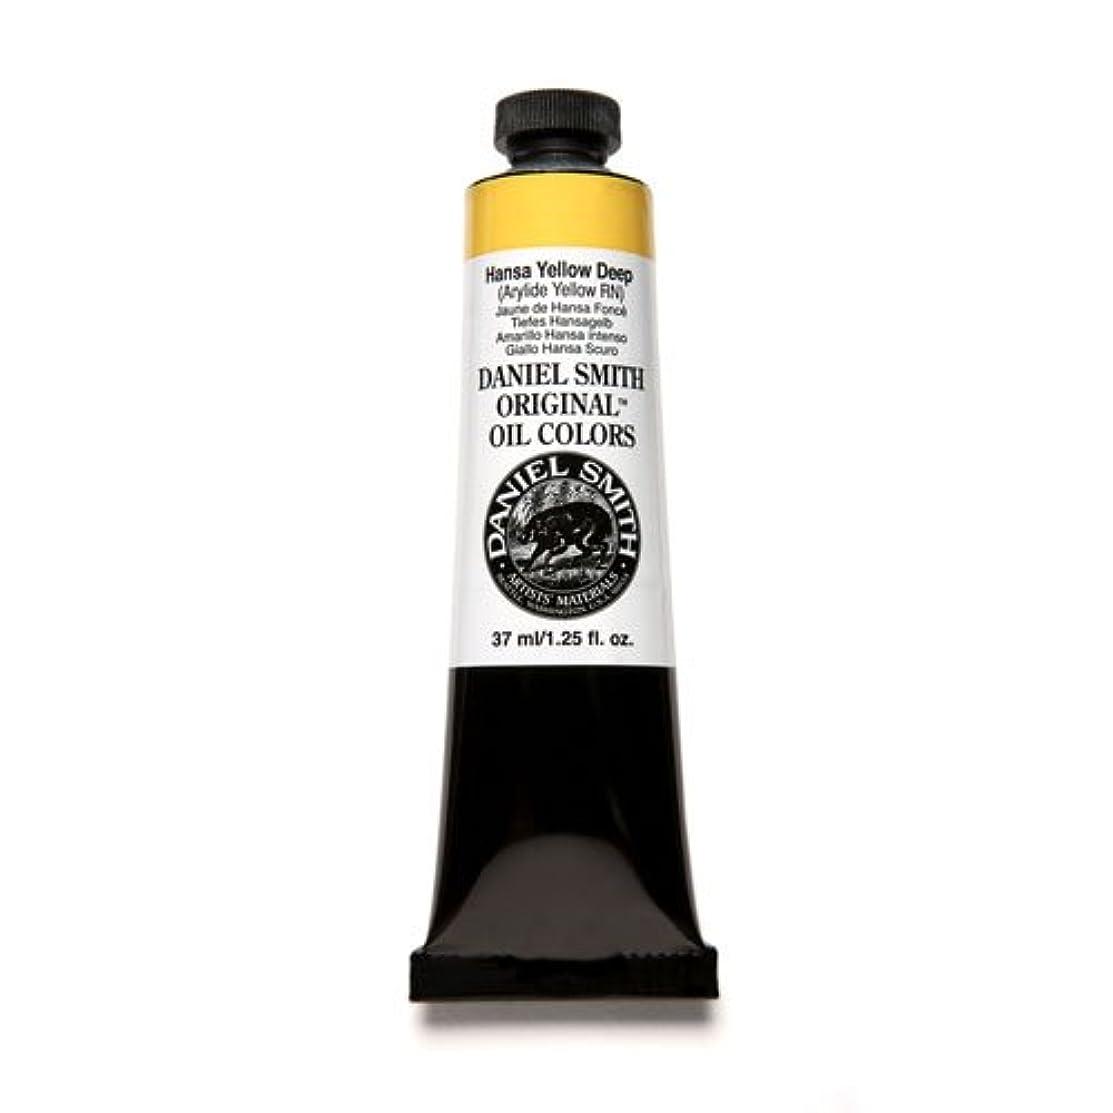 Daniel Smith Original Oil Color, Hansa Yellow Deep, 1.25 fl oz